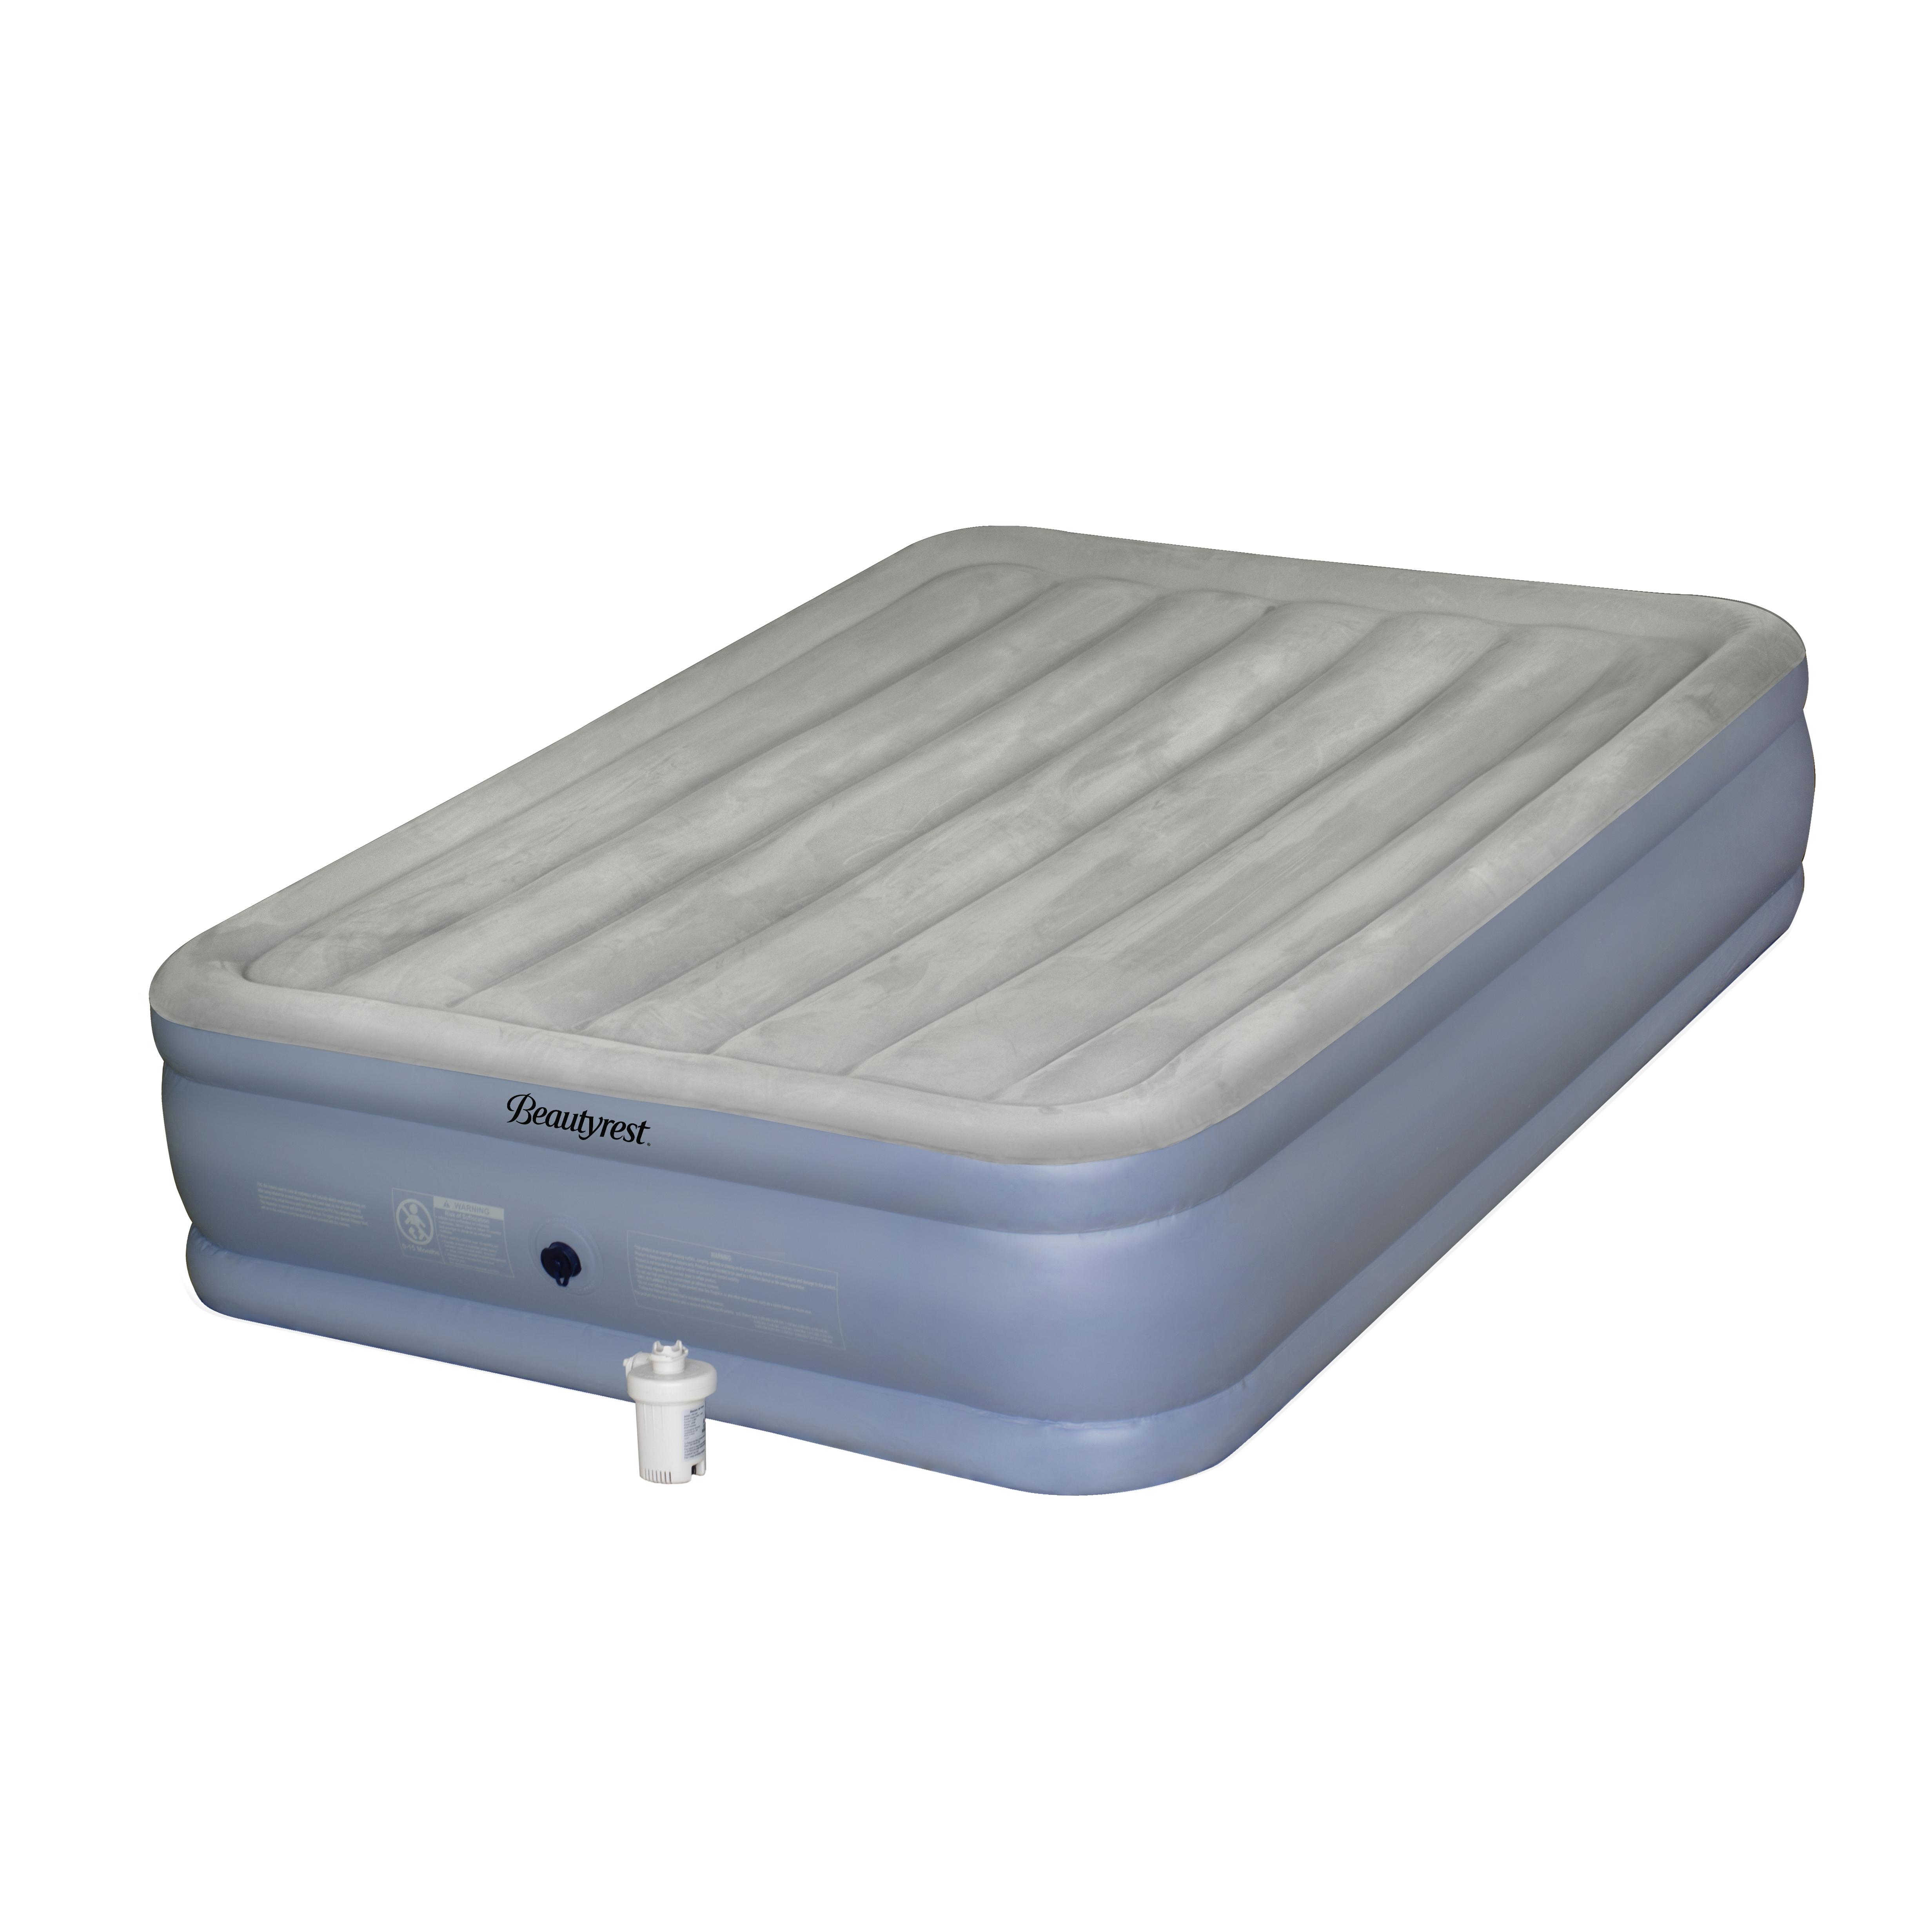 Simmons Full Beautyrest Hi Loft Raised Air Bed Mattress